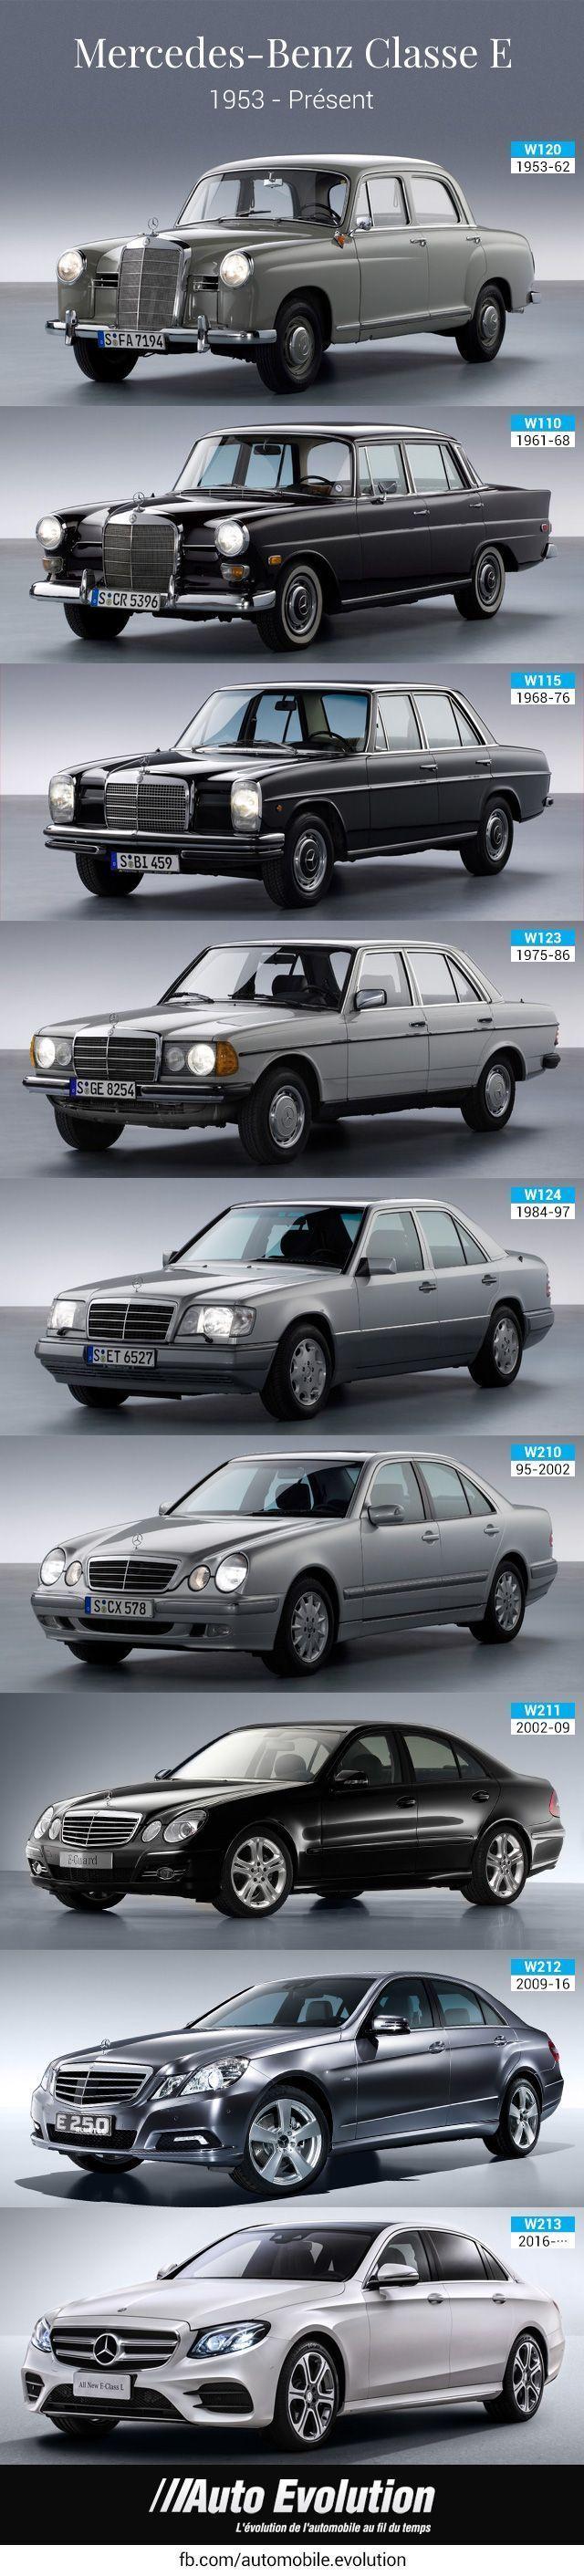 Mercedes Benz E class evolution History Mercedes Benz E Class – #Audi – Fahrzeuge